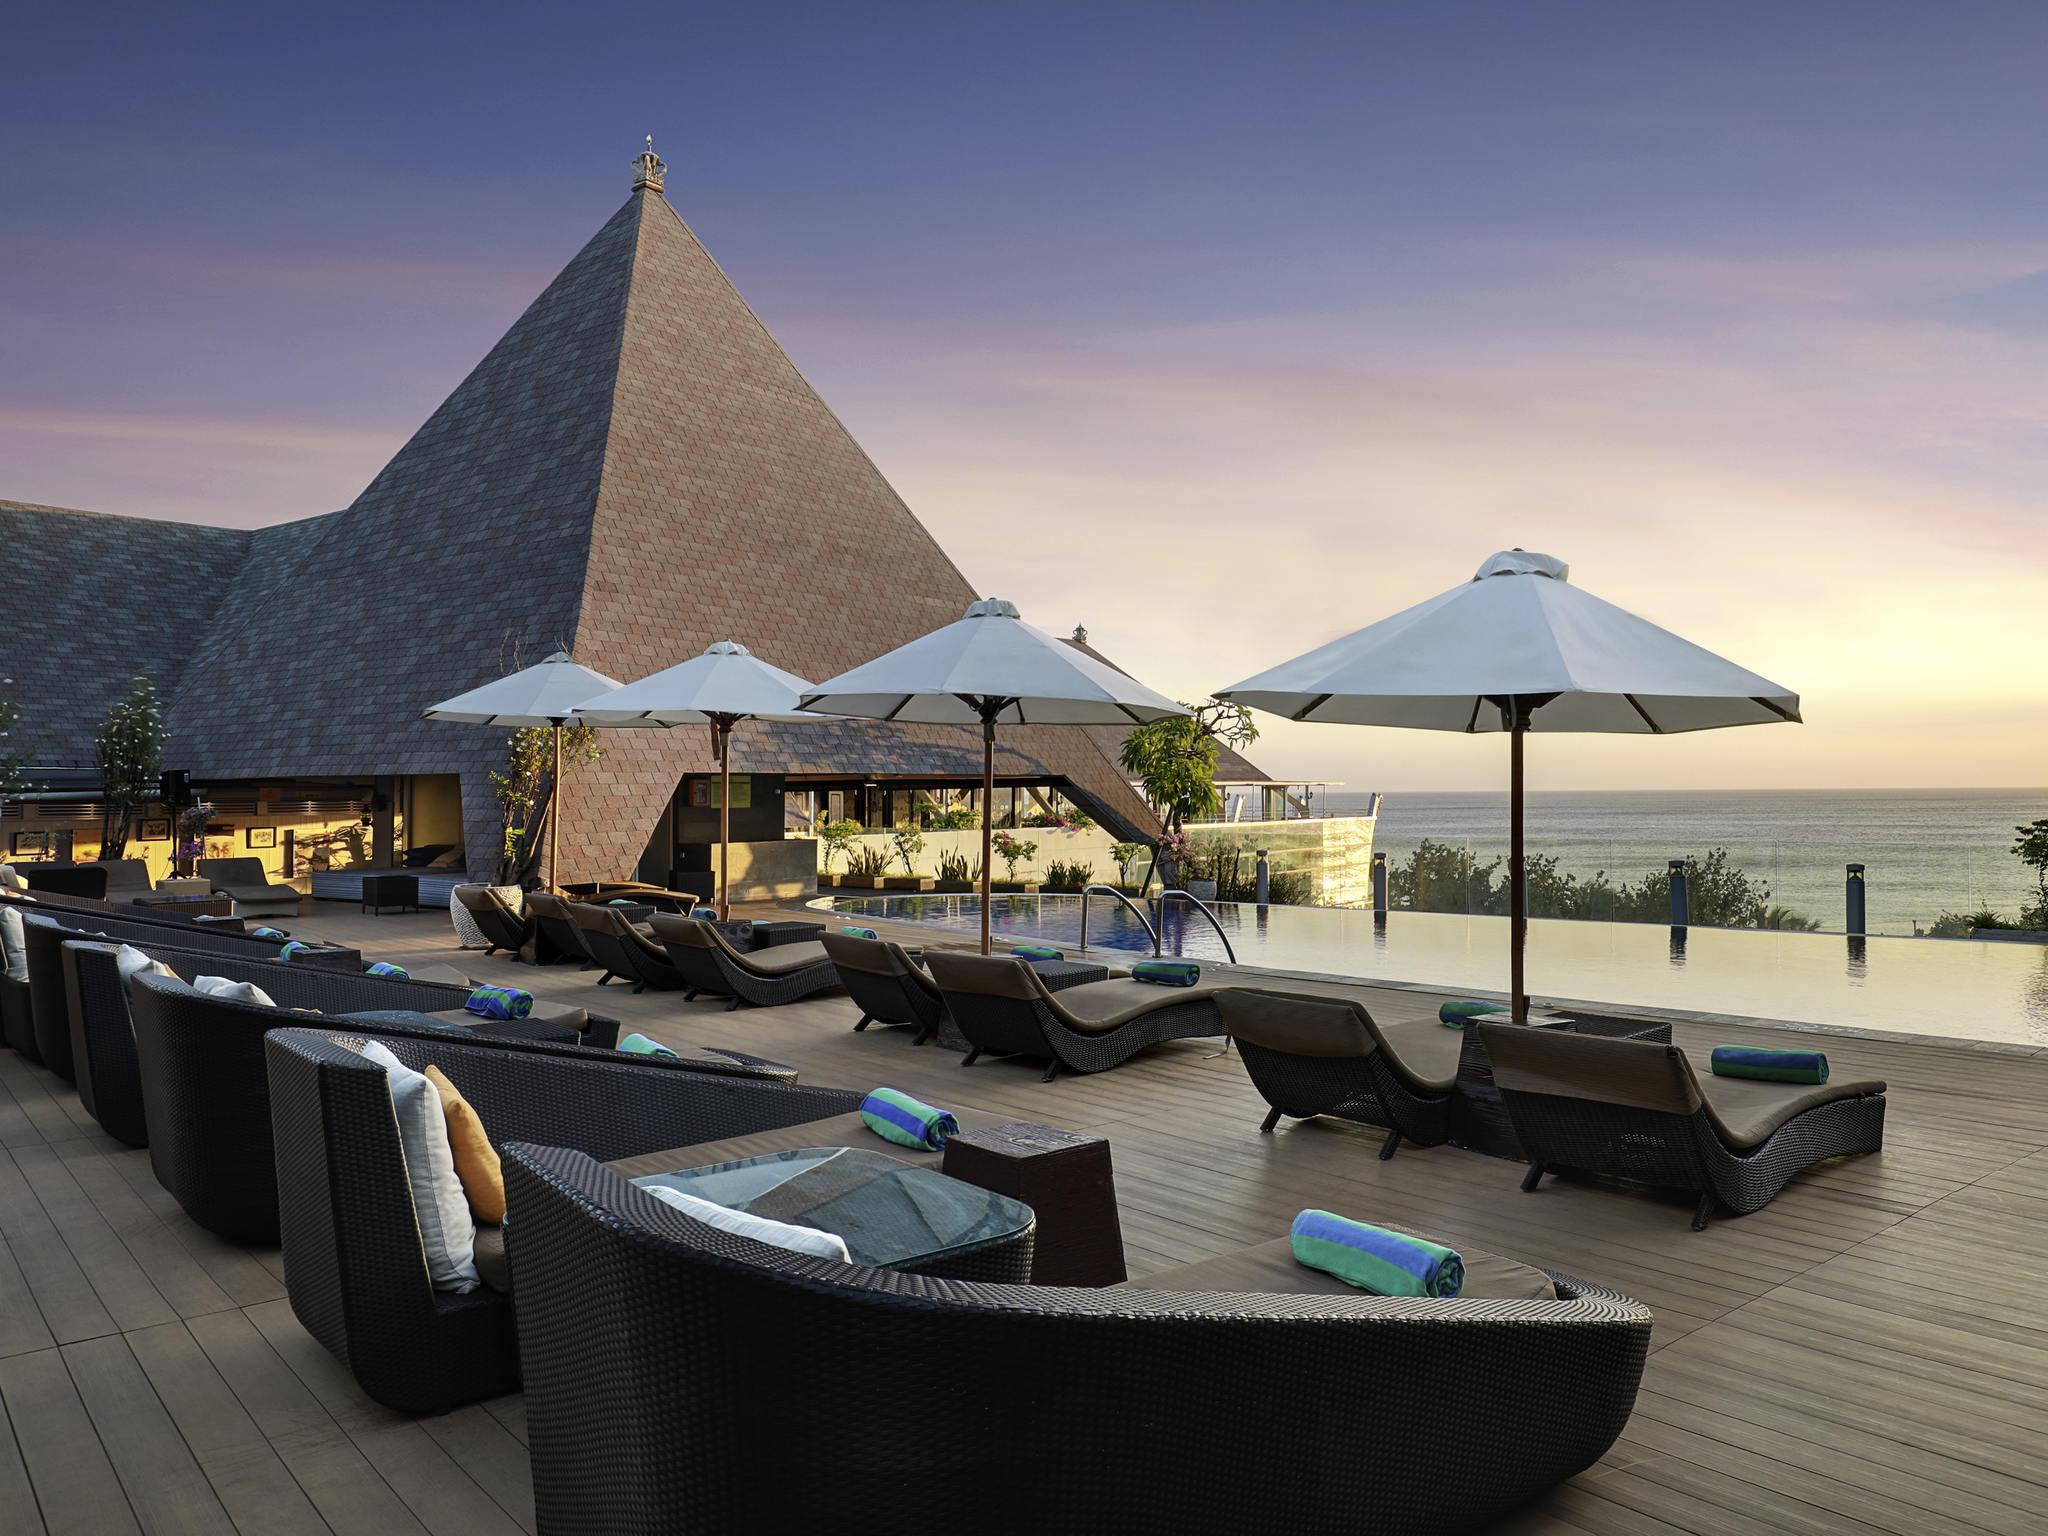 Hôtel - The Kuta Beach Heritage Hotel Bali - Géré par AccorHotels